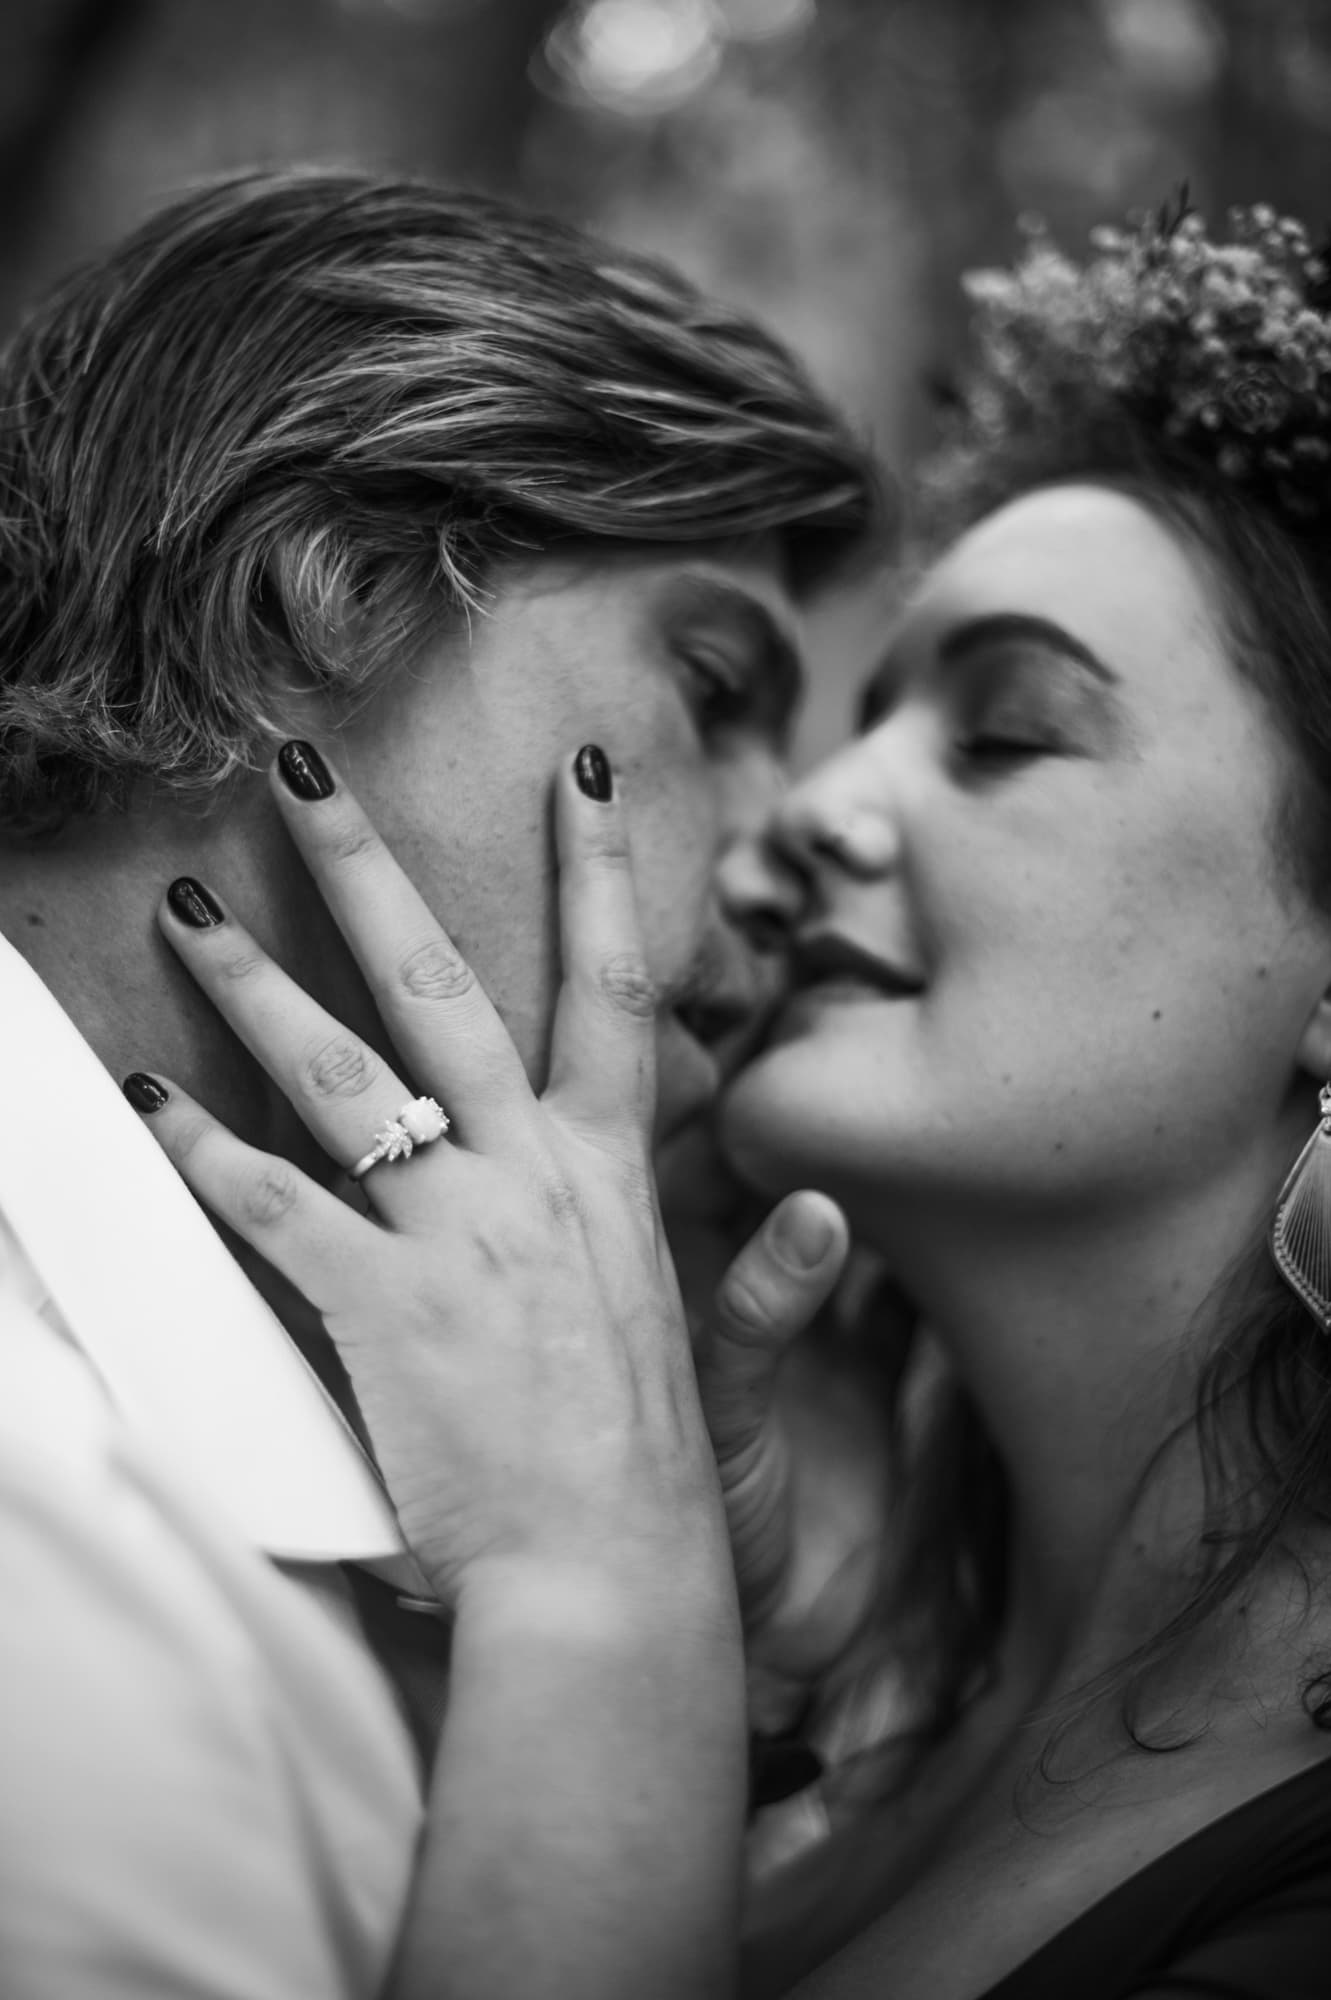 wesley-lanie-george-fernridge-engagement-June-Richards-Photography-Destination-Weddings-Elopements-Garden-Route-40